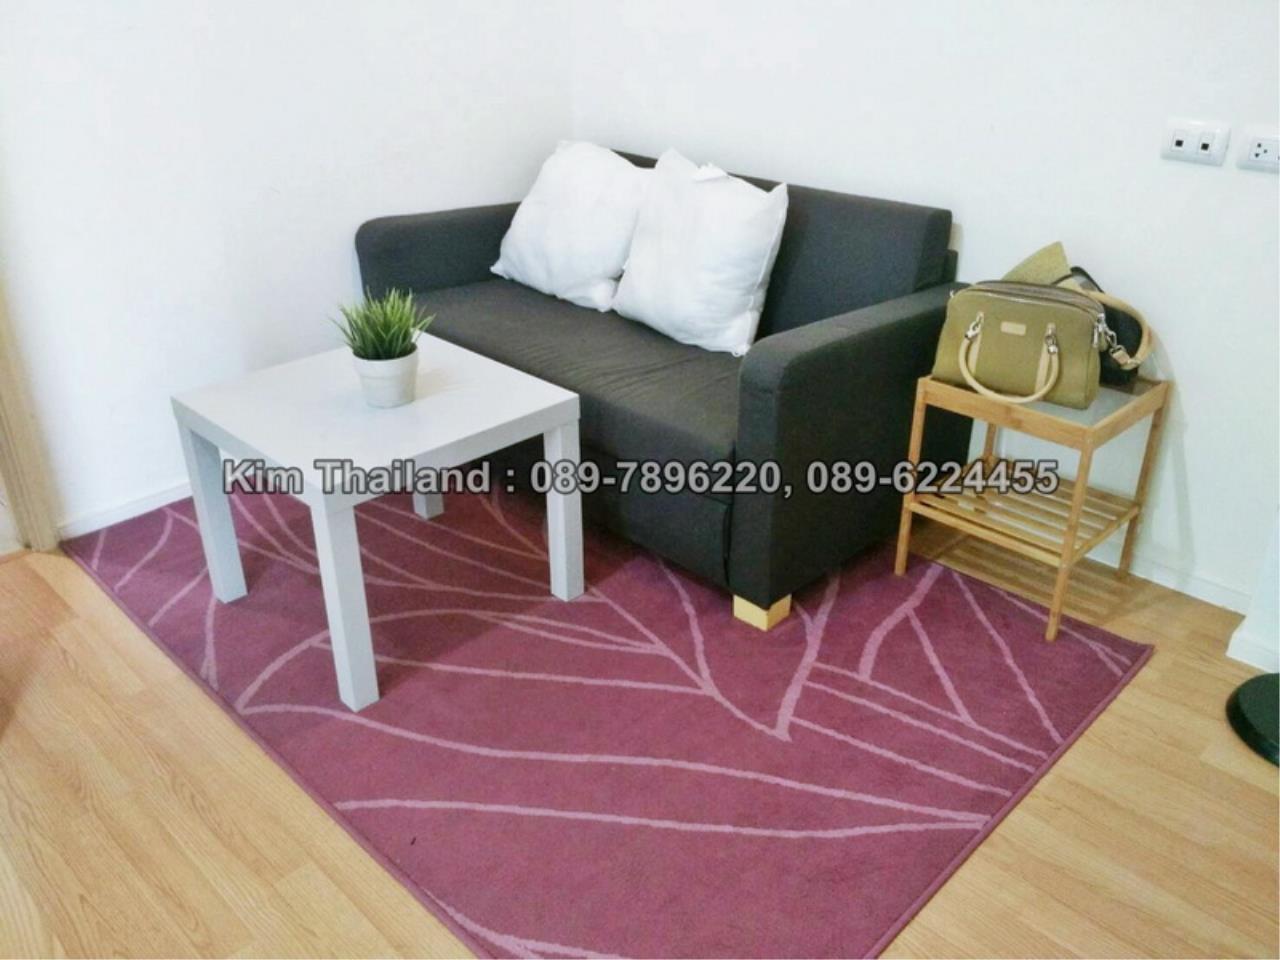 BKKcondorental Agency's For rent,Condo Lumpini Ville Prachachuen-Phongphet 2. Building B,  Area 26 sq.m.  1